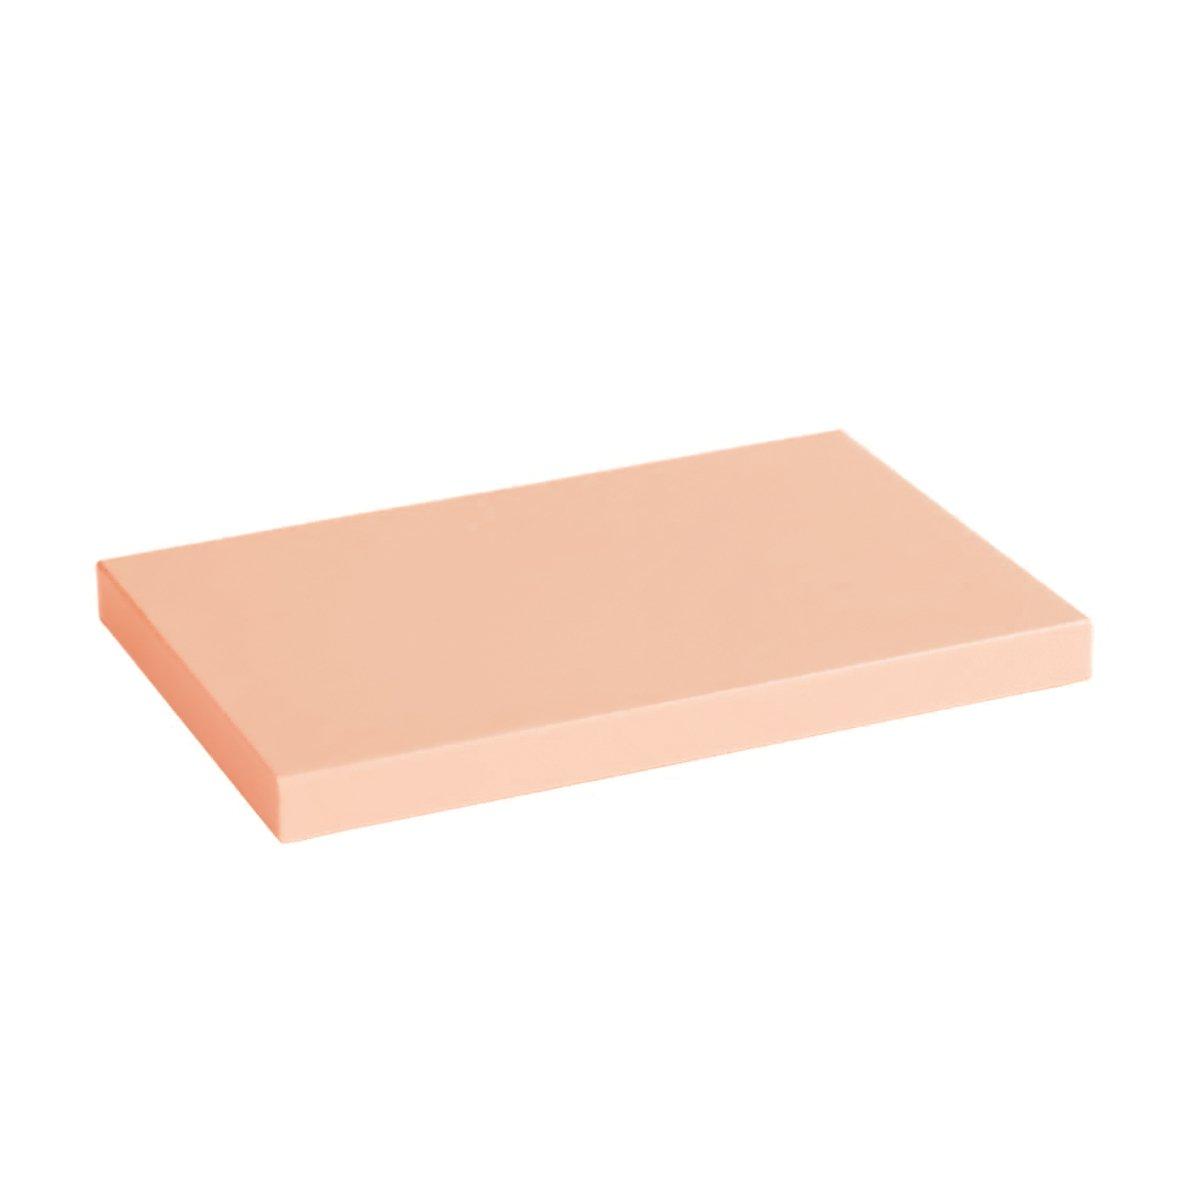 HAY Chopping Board Snijplank - Rechthoekig M/Perzik